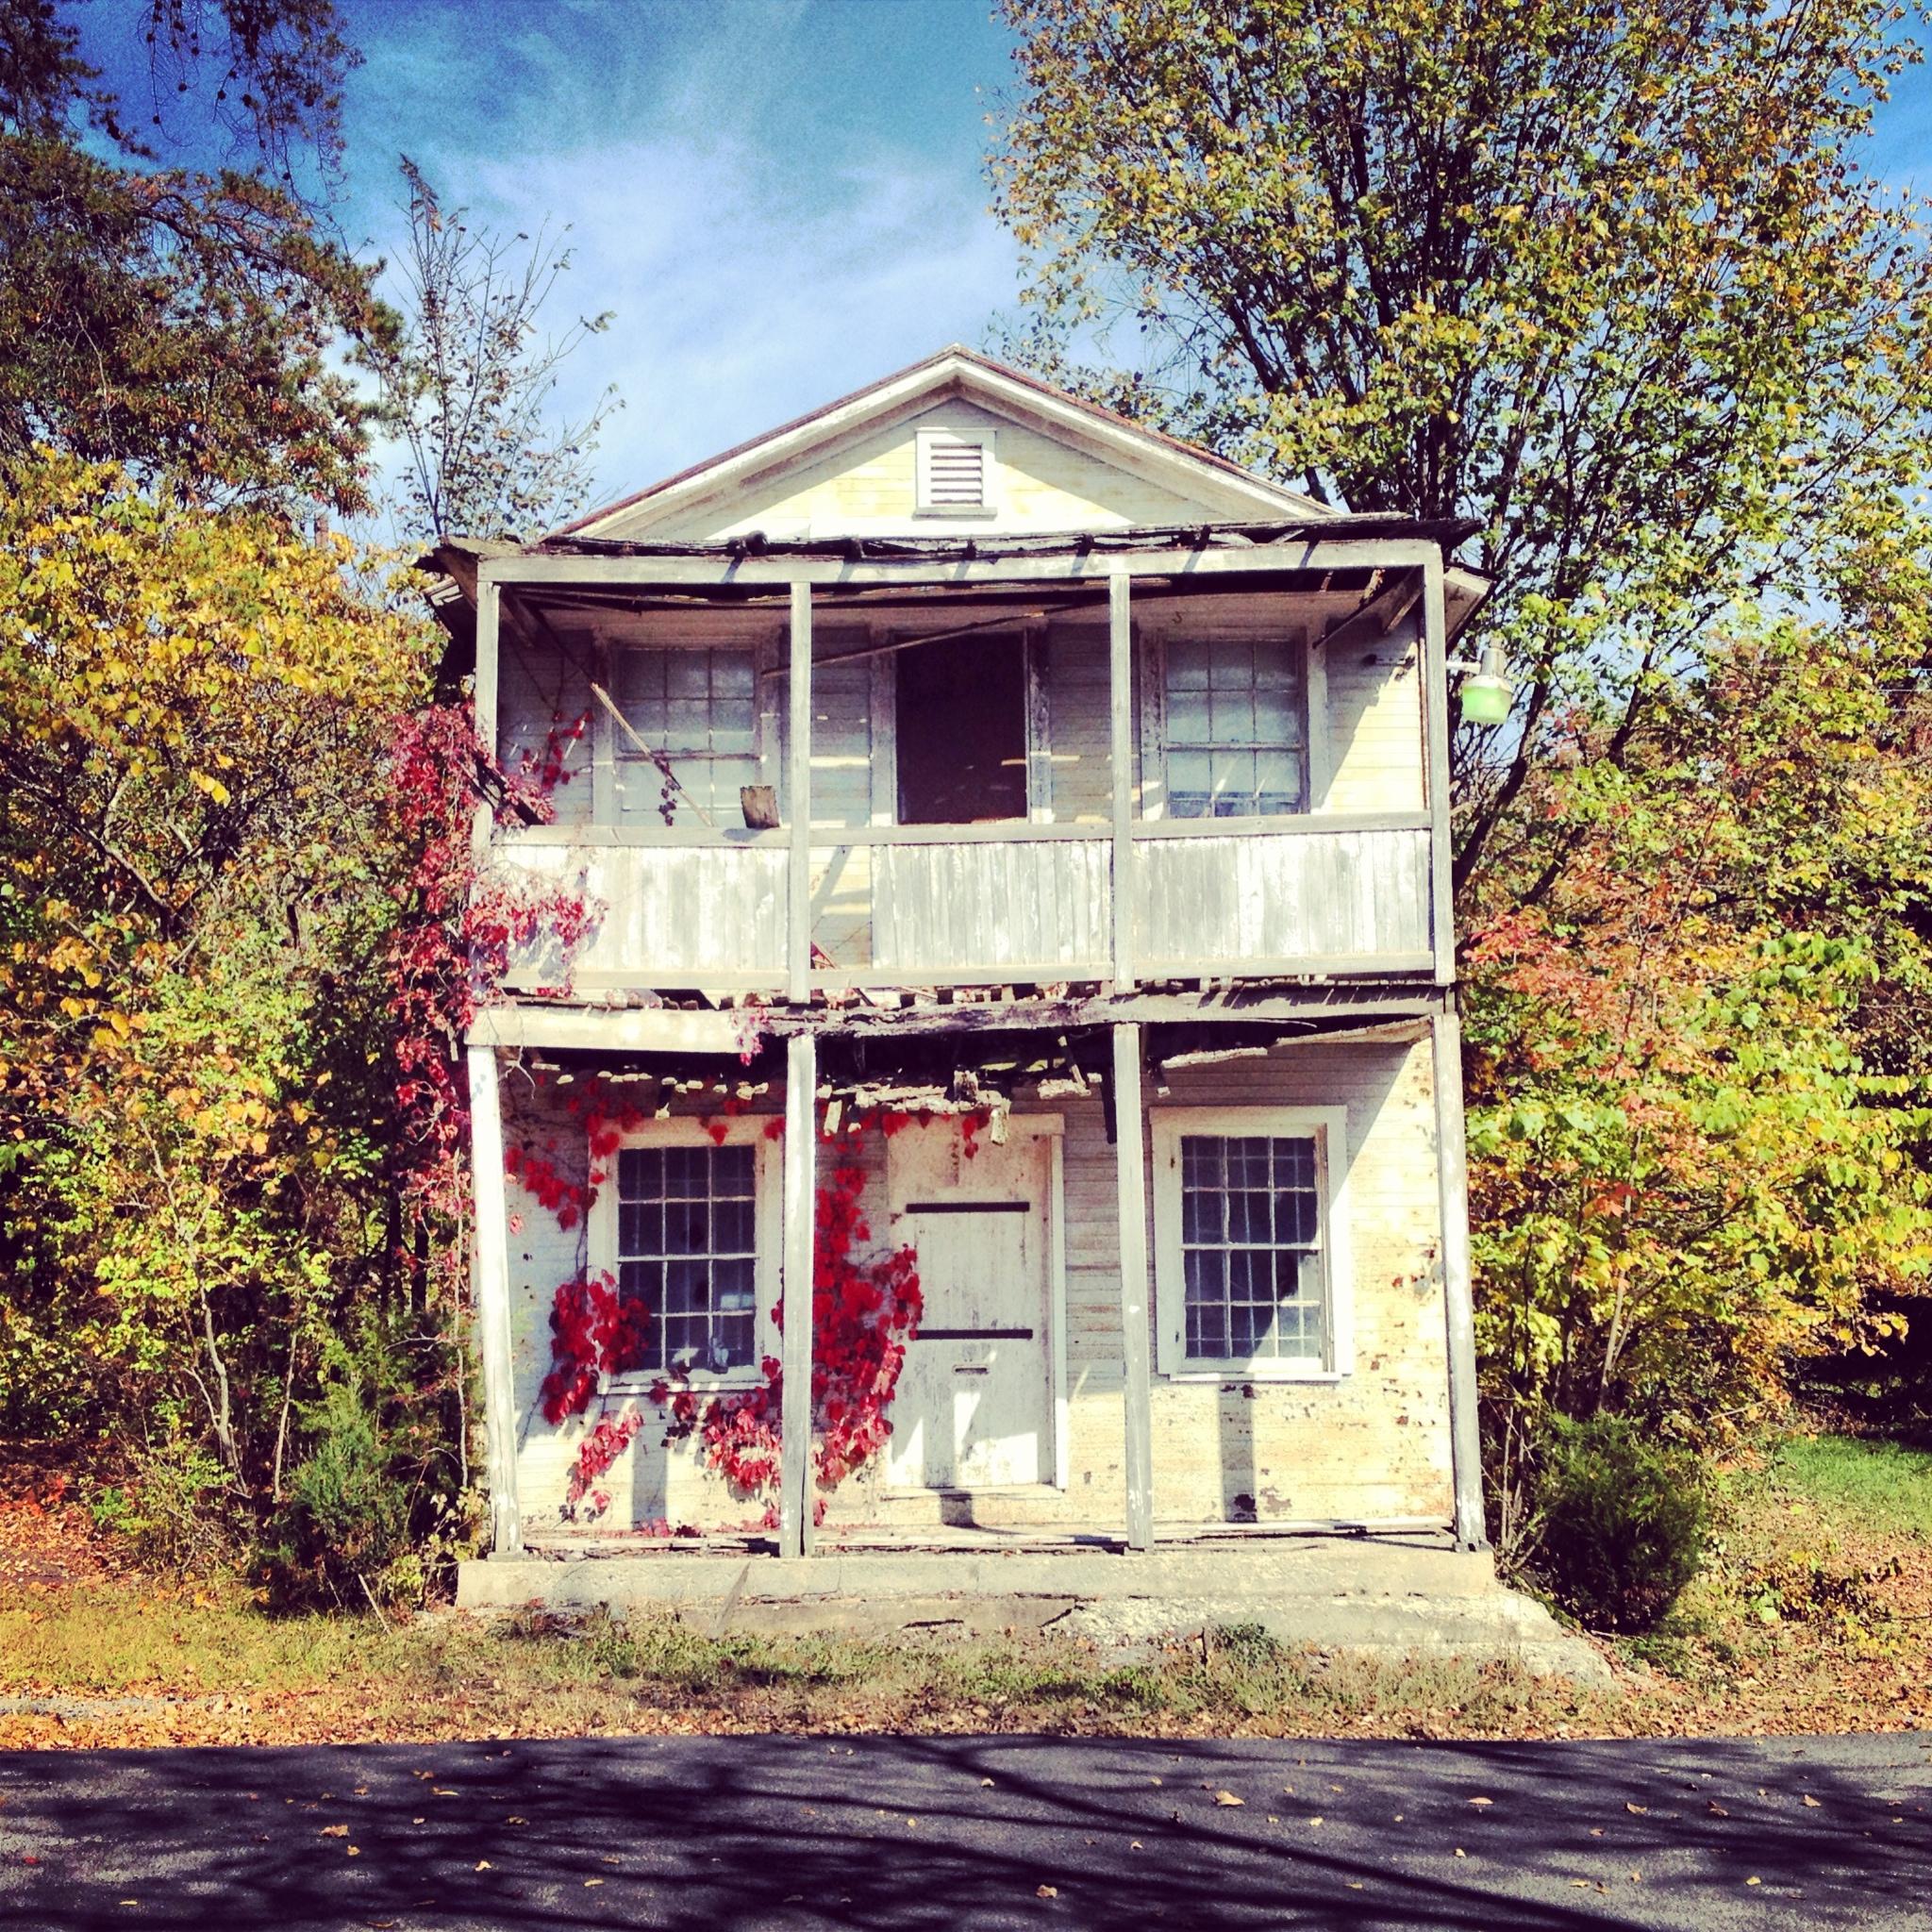 Shanks Cemeteries, Funeral Services & Flowers In West Virginia